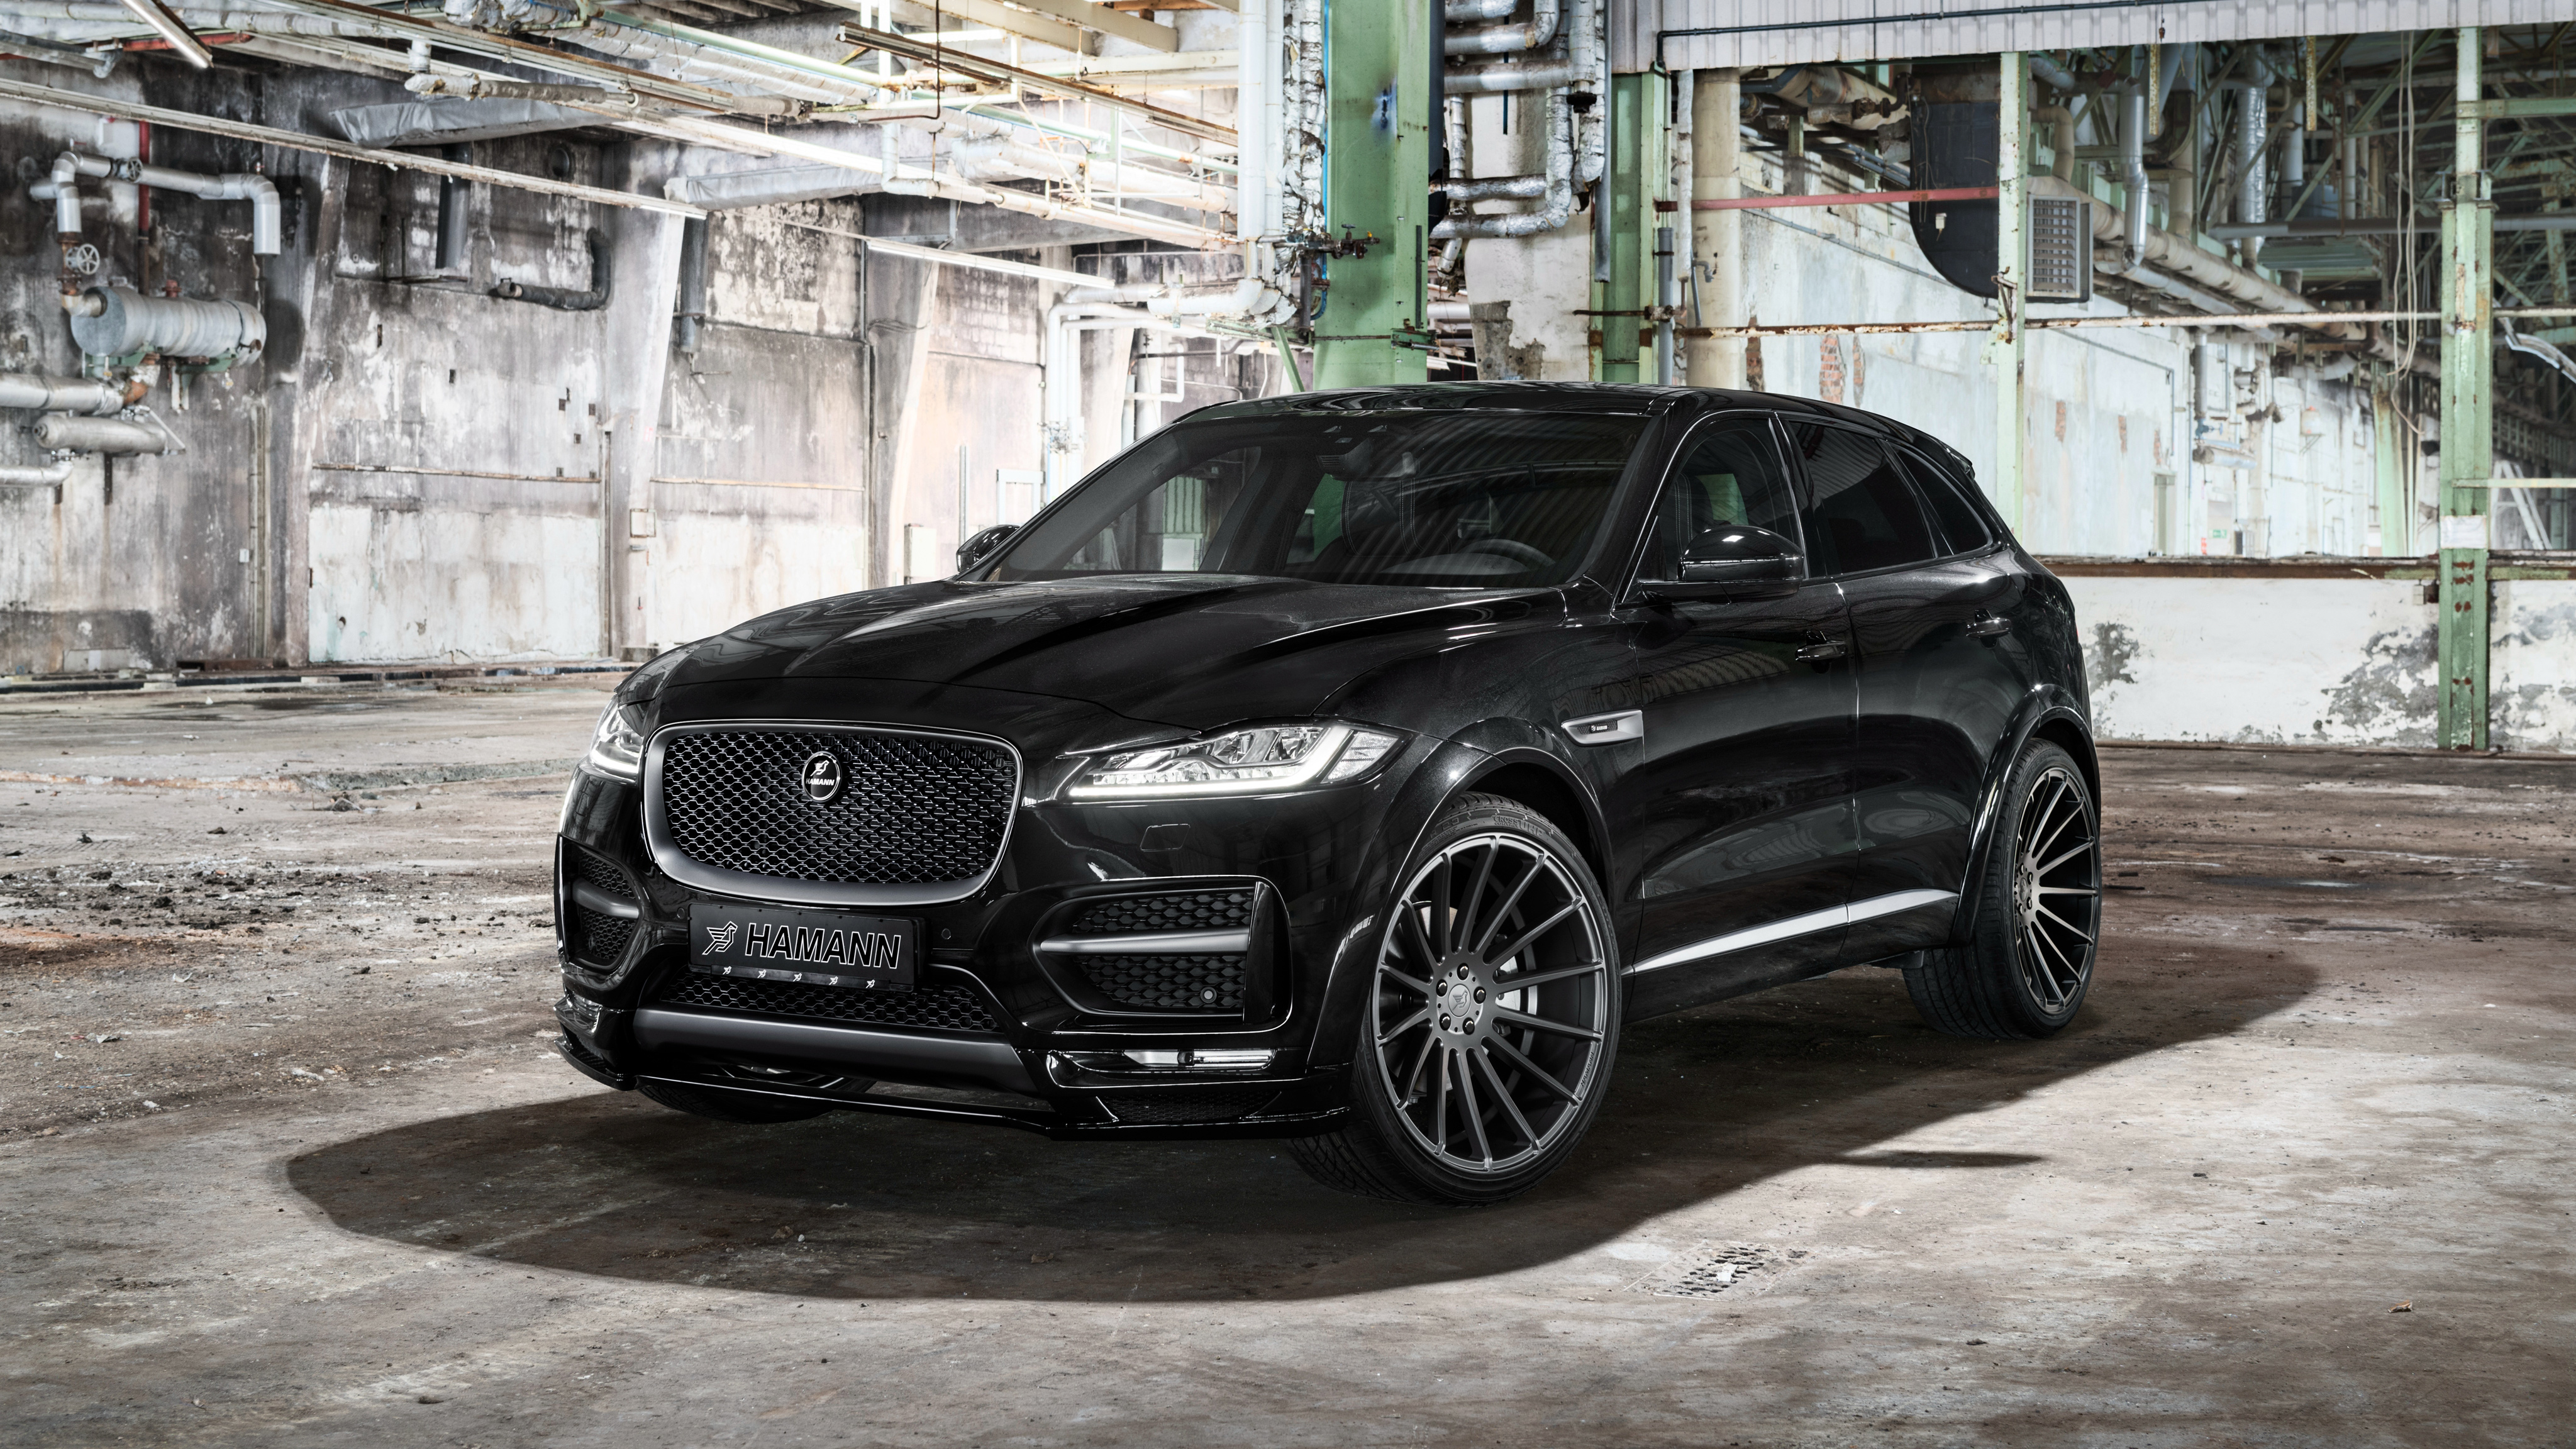 2017 hamann jaguar f pace 4k wallpaper hd car wallpapers. Black Bedroom Furniture Sets. Home Design Ideas